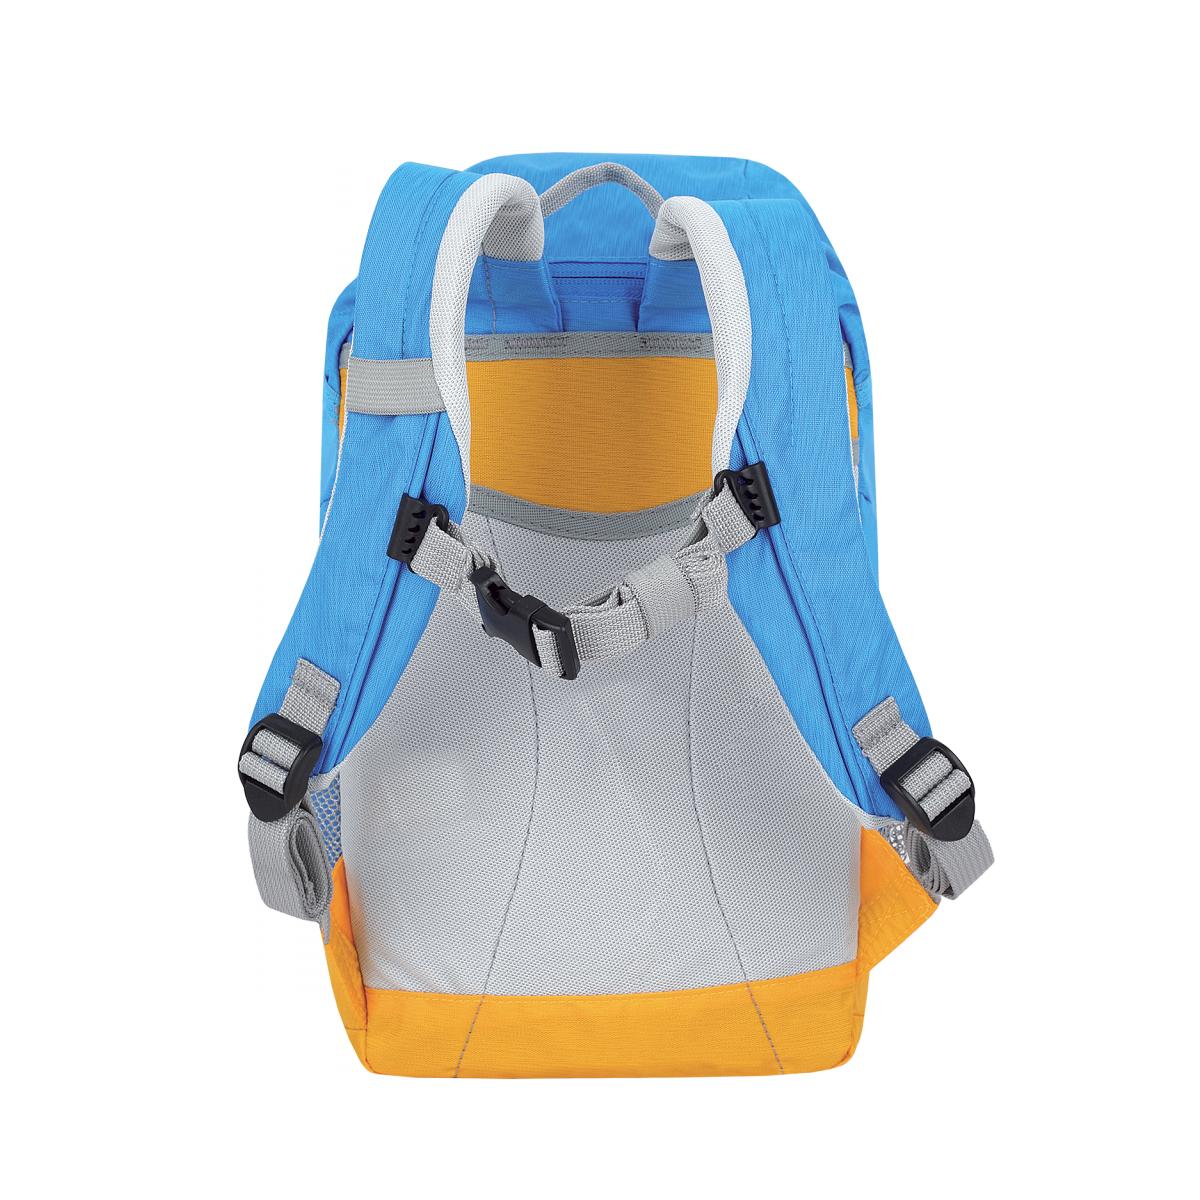 b03f129b424 Dětský batoh - Sweety 6l – modrá